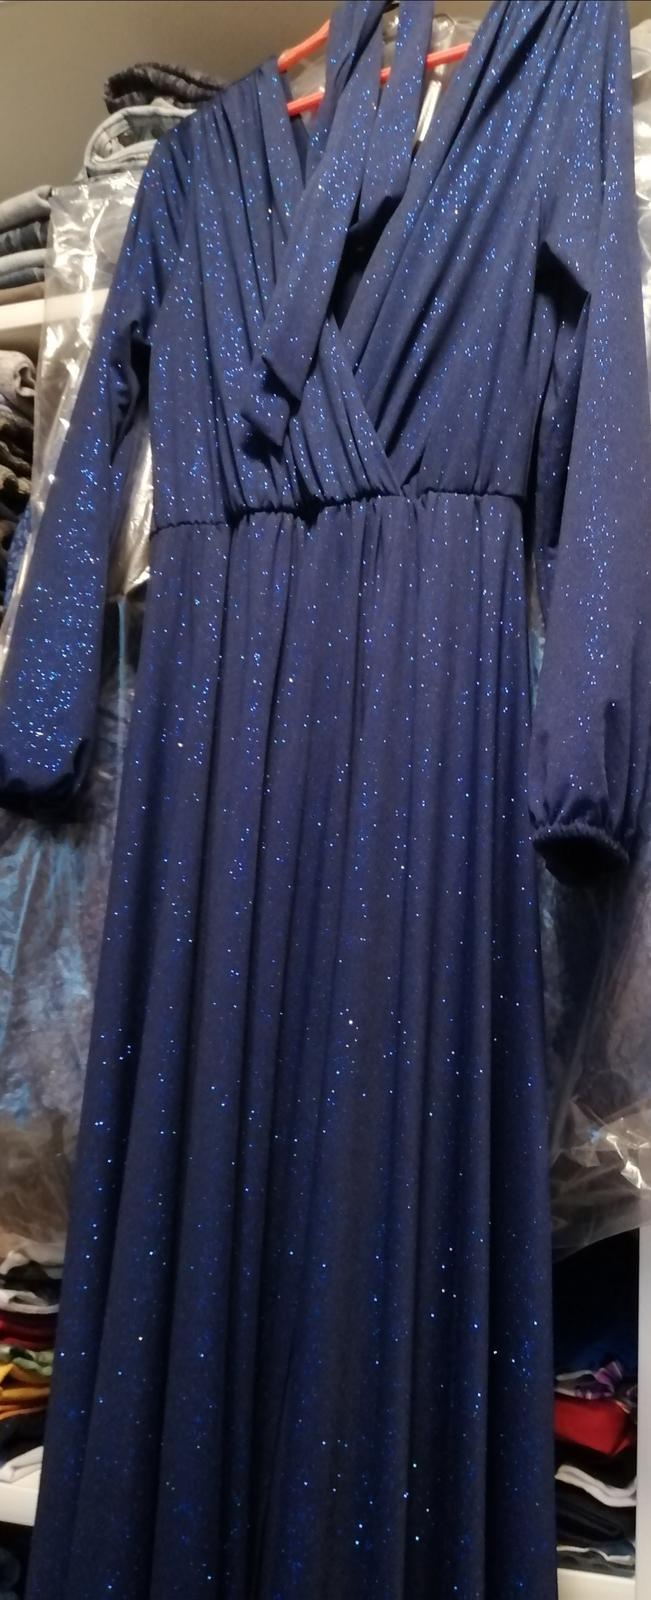 Šaty - Obrázok č. 1